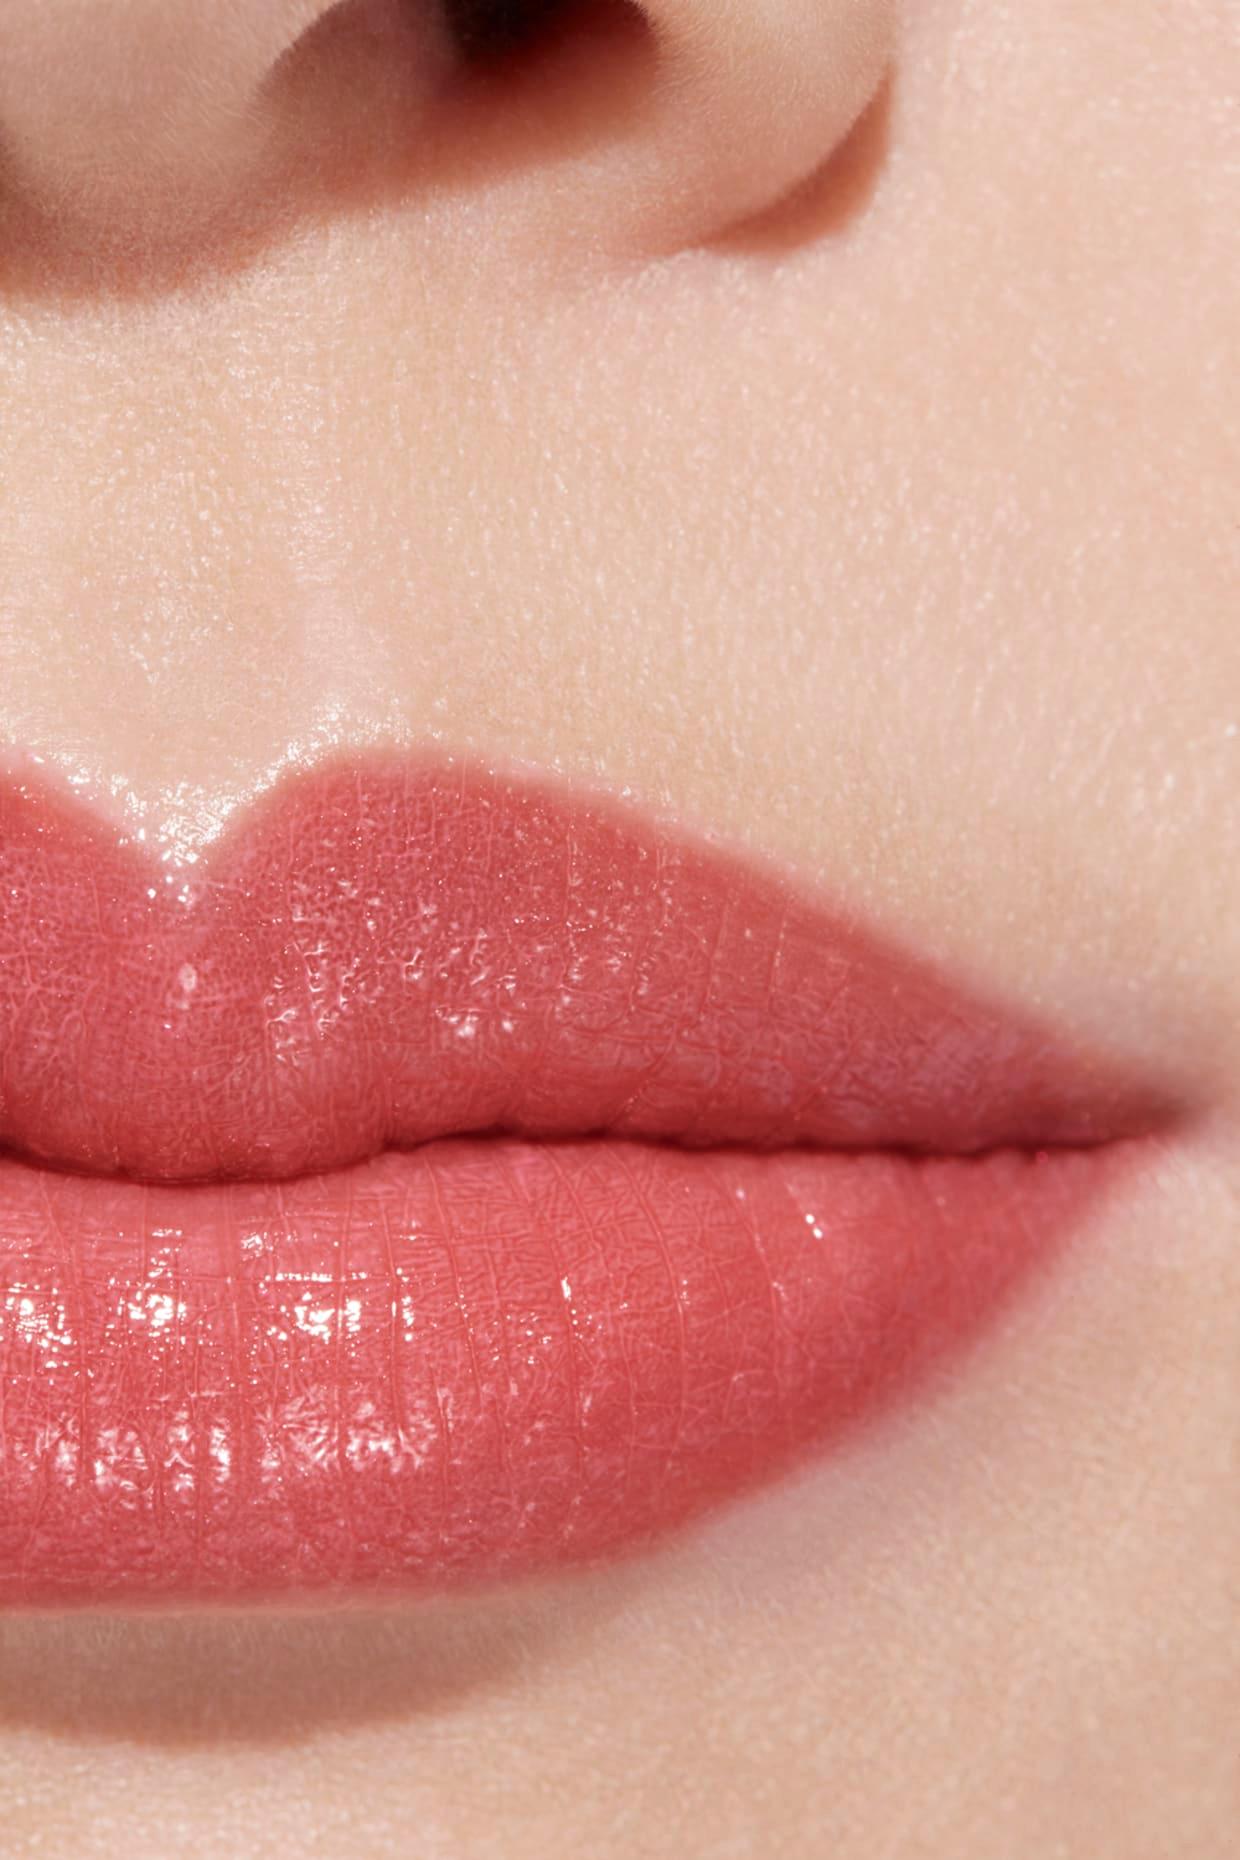 Rouge Coco Flash Hydrating Vibrant Shine Lip Colour 90 Jour Chanel Lip Colour Lip Colors Lipstick